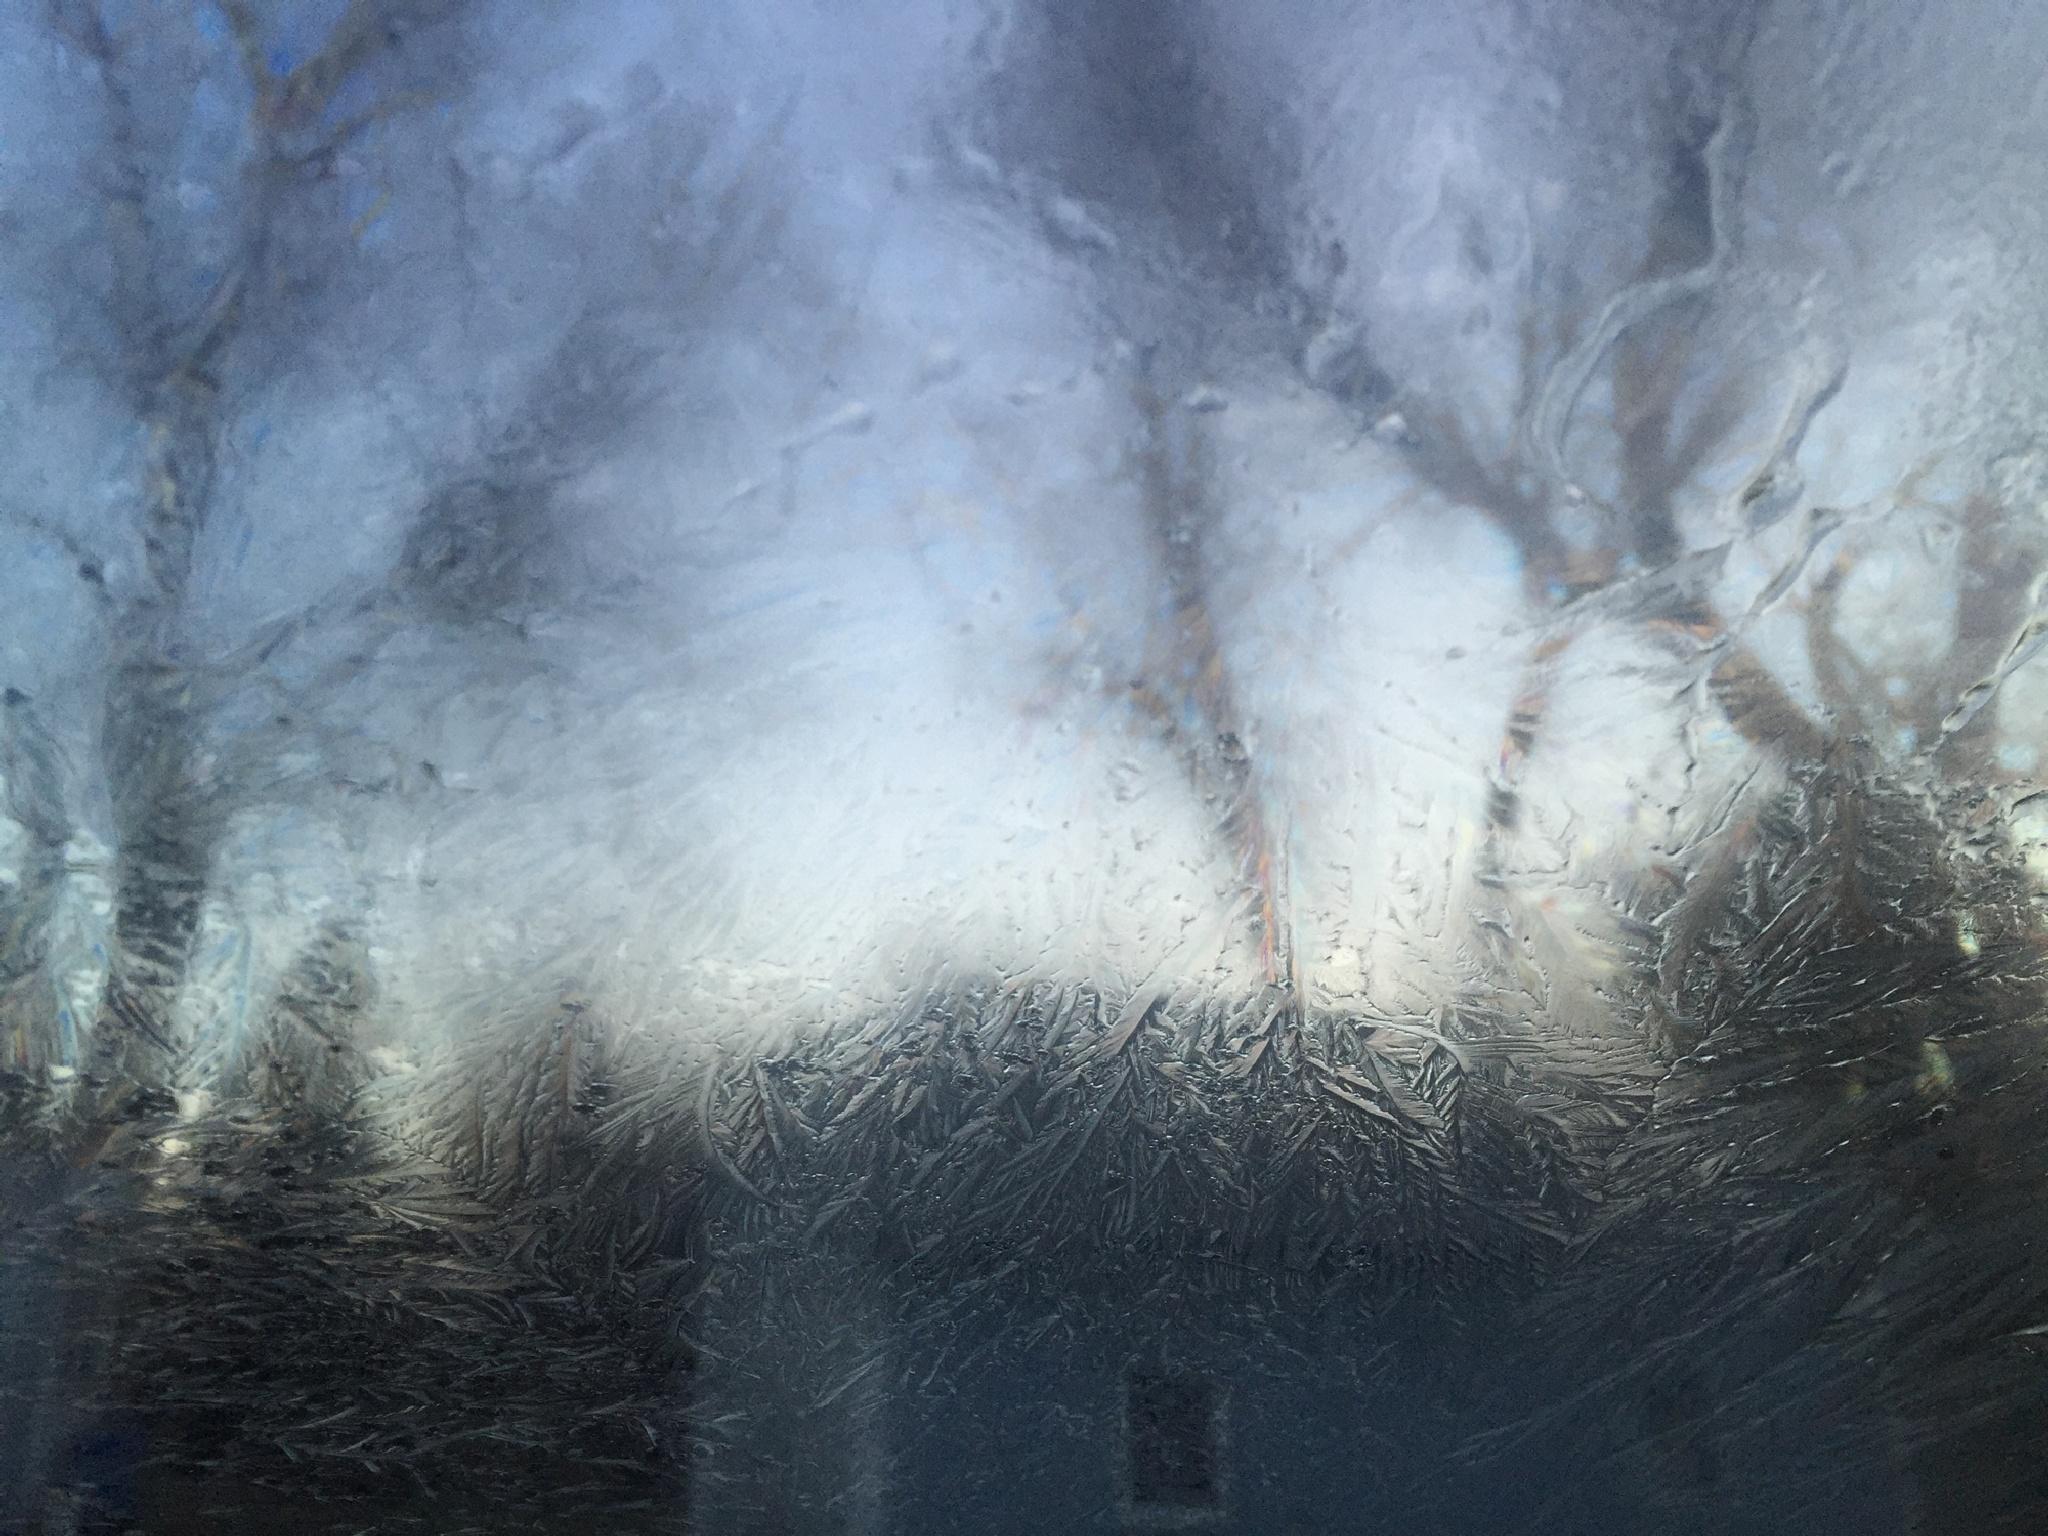 Frosty fog by cboehlkejr